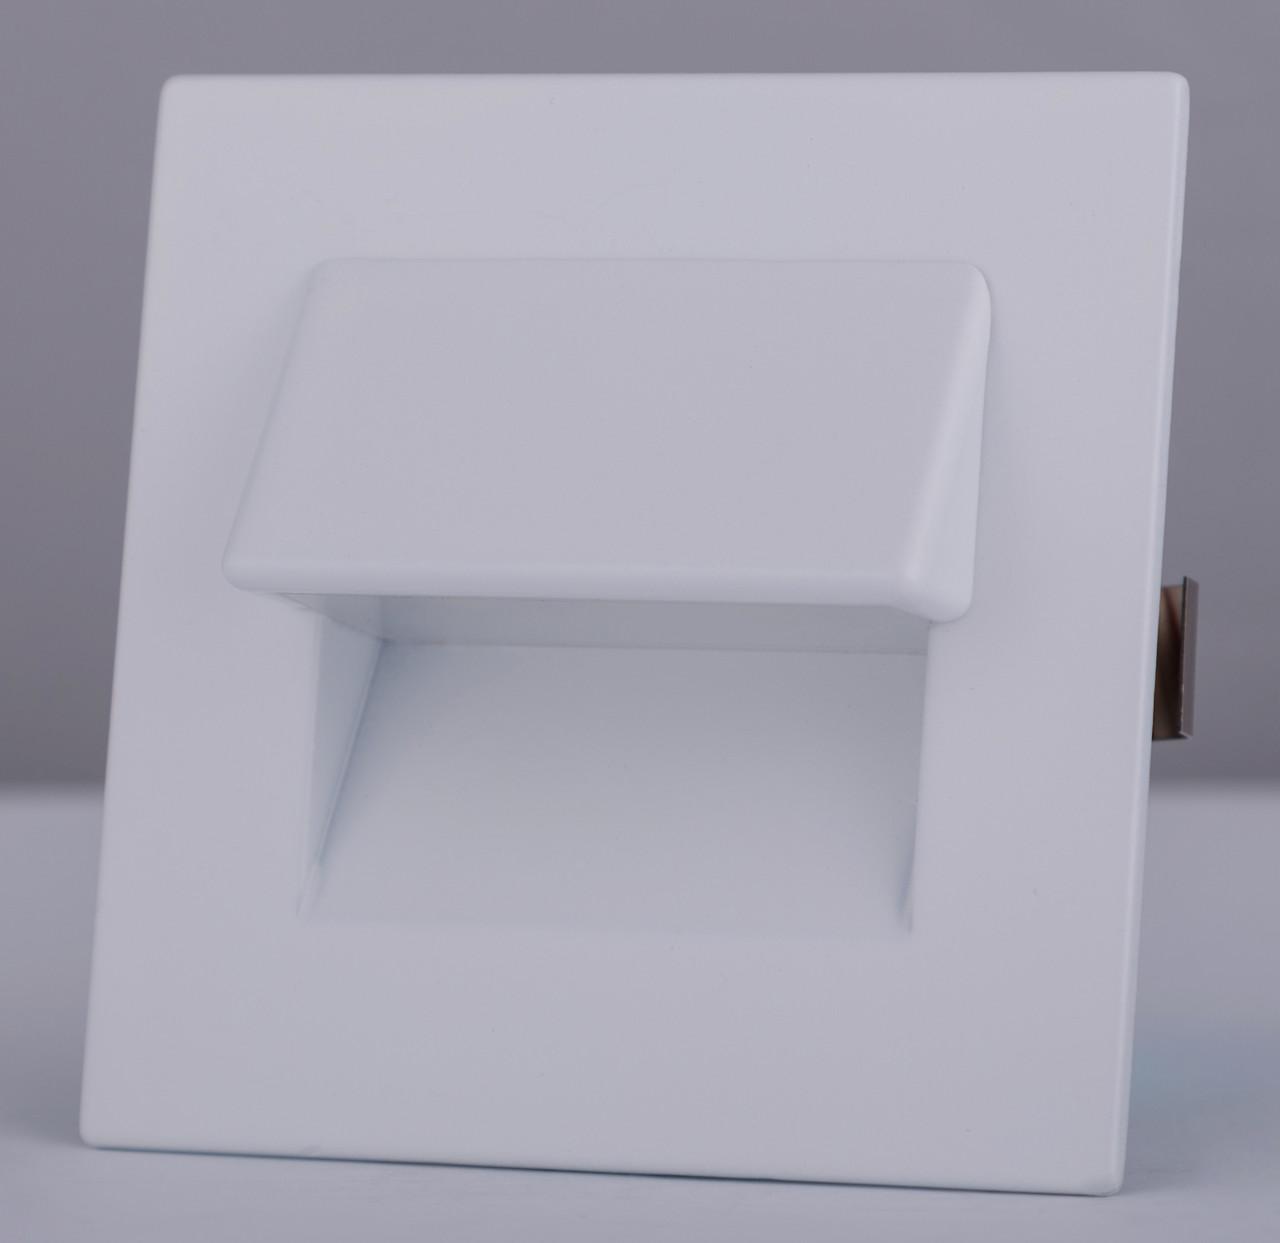 Подсветка LED декоративная LIVE, белый, тёплый белый